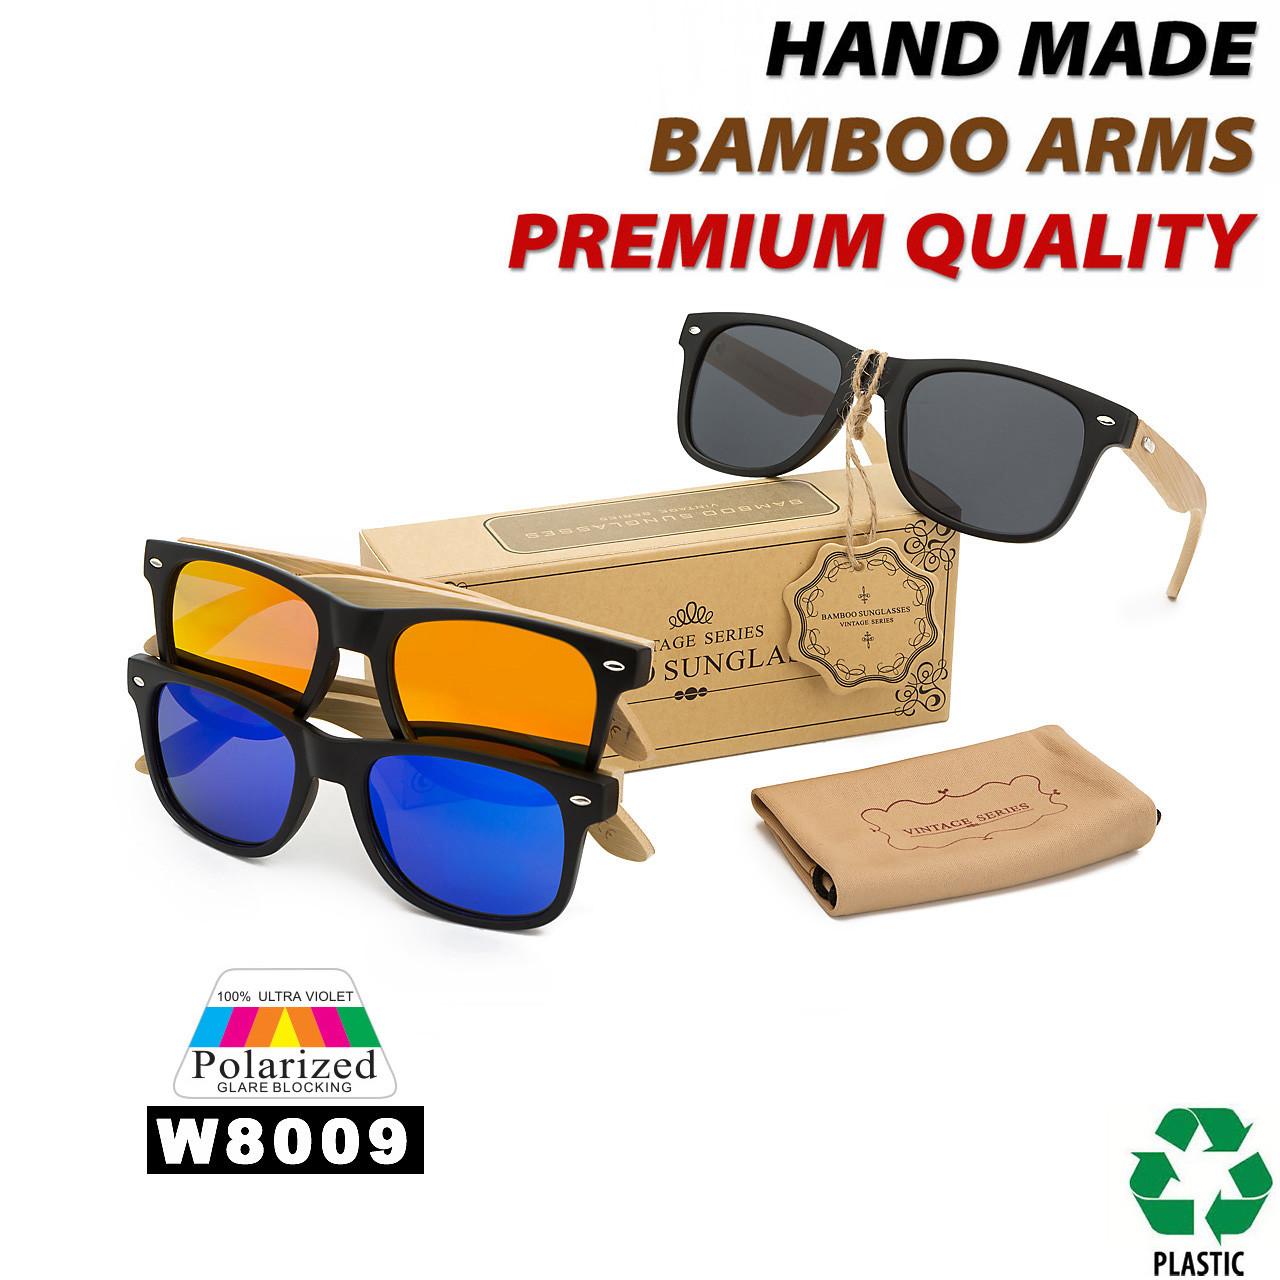 Polarized Bamboo Wood California Classics - Style #W8009